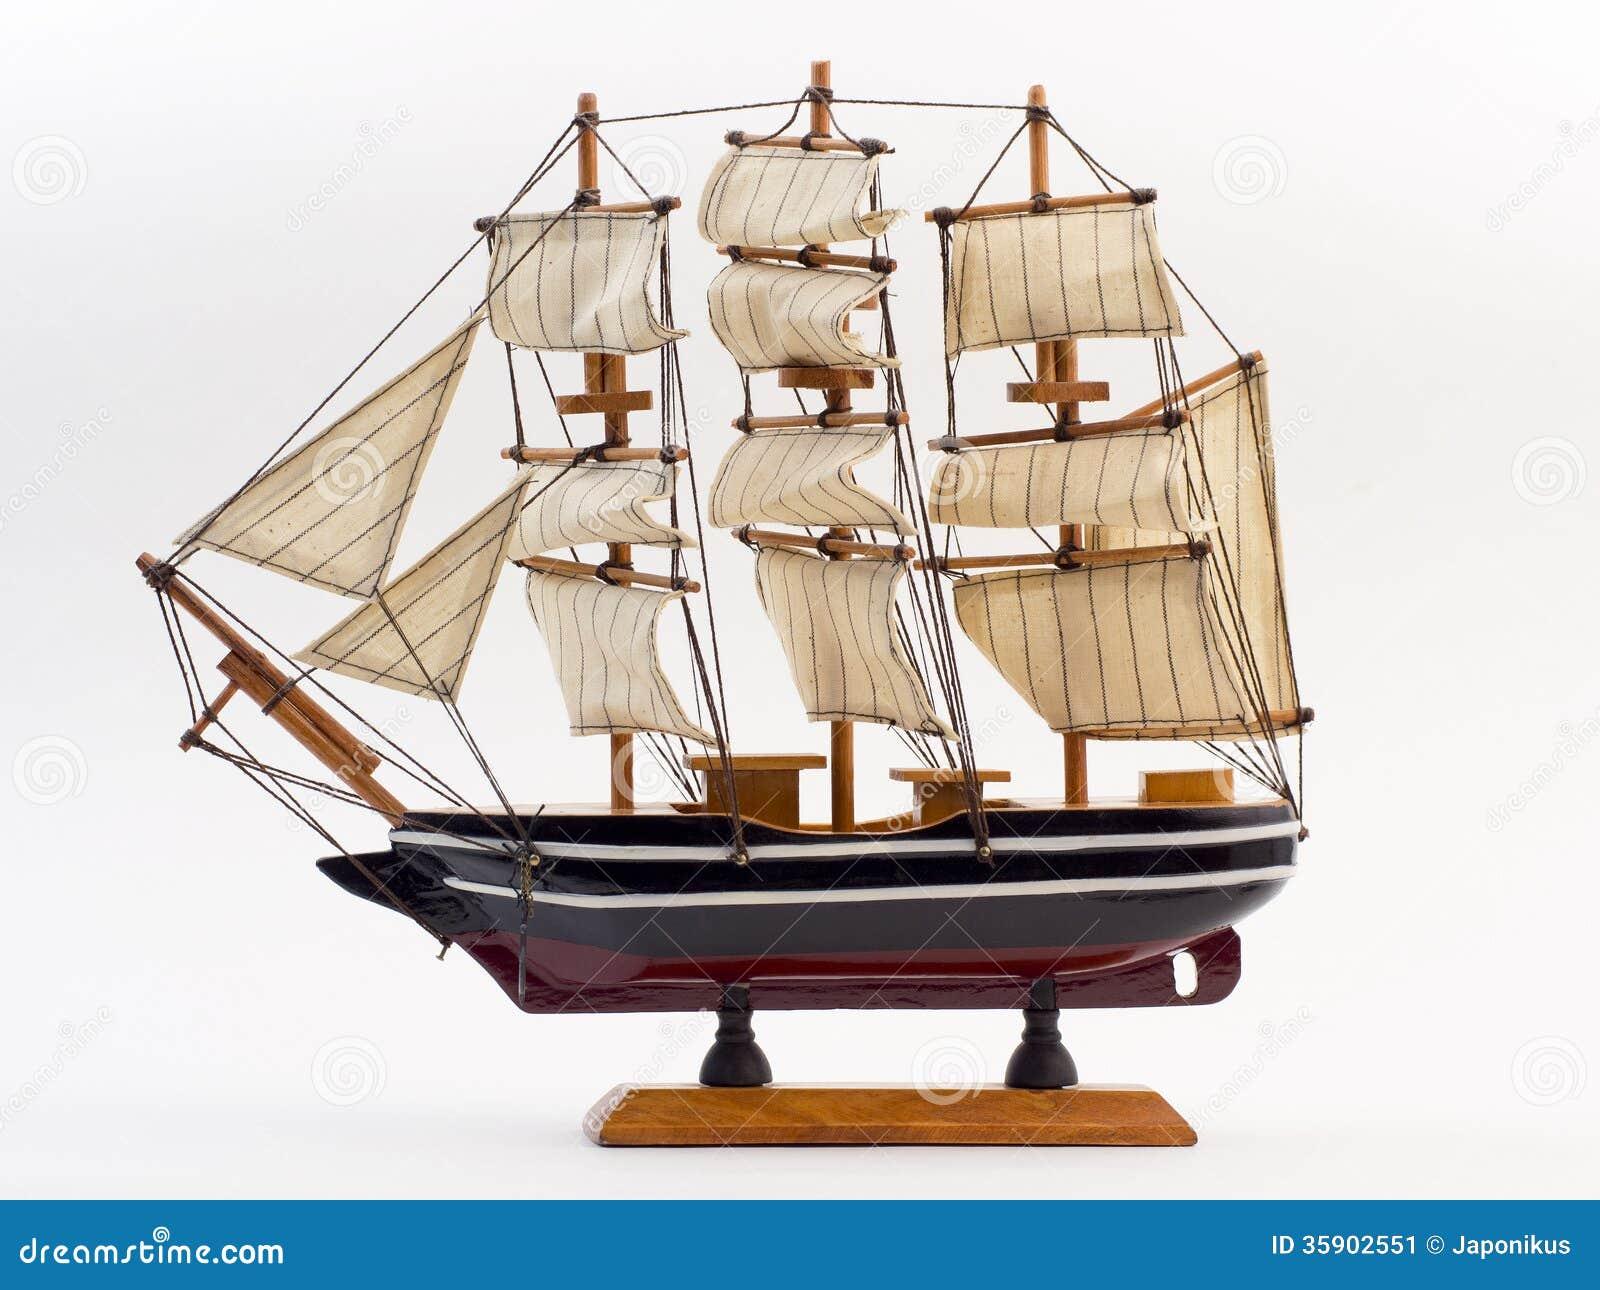 Wooden Ship Figurine Stock Image - Image: 35902551